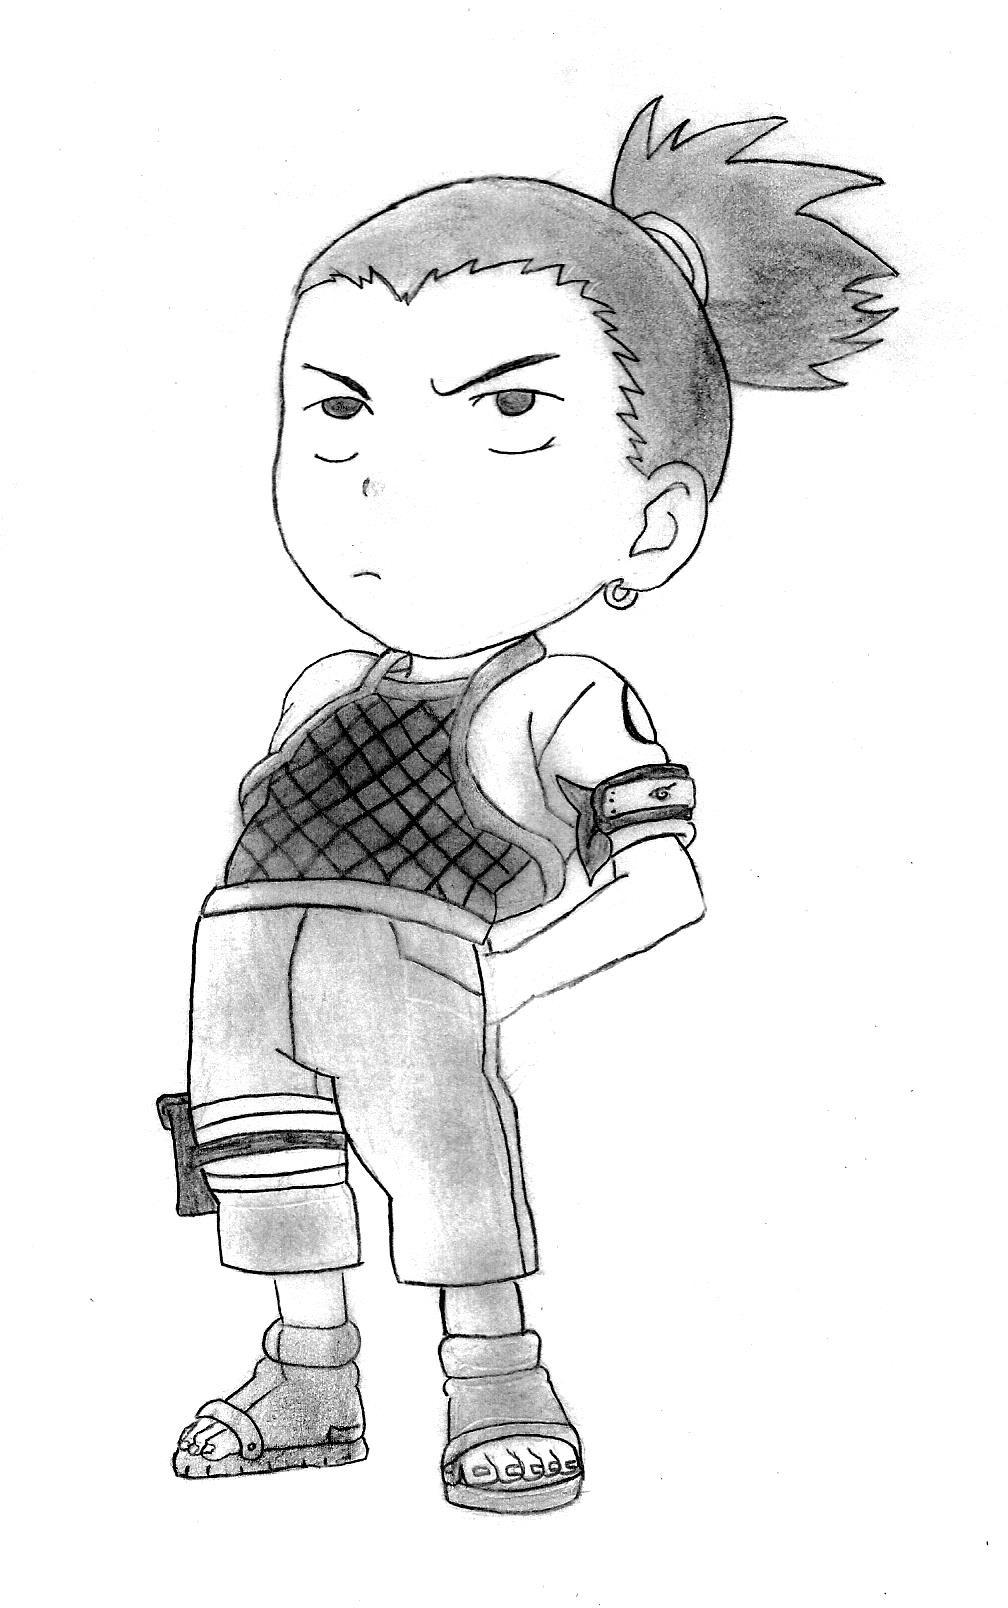 Shikamaru Chibi by Walkenn on DeviantArt